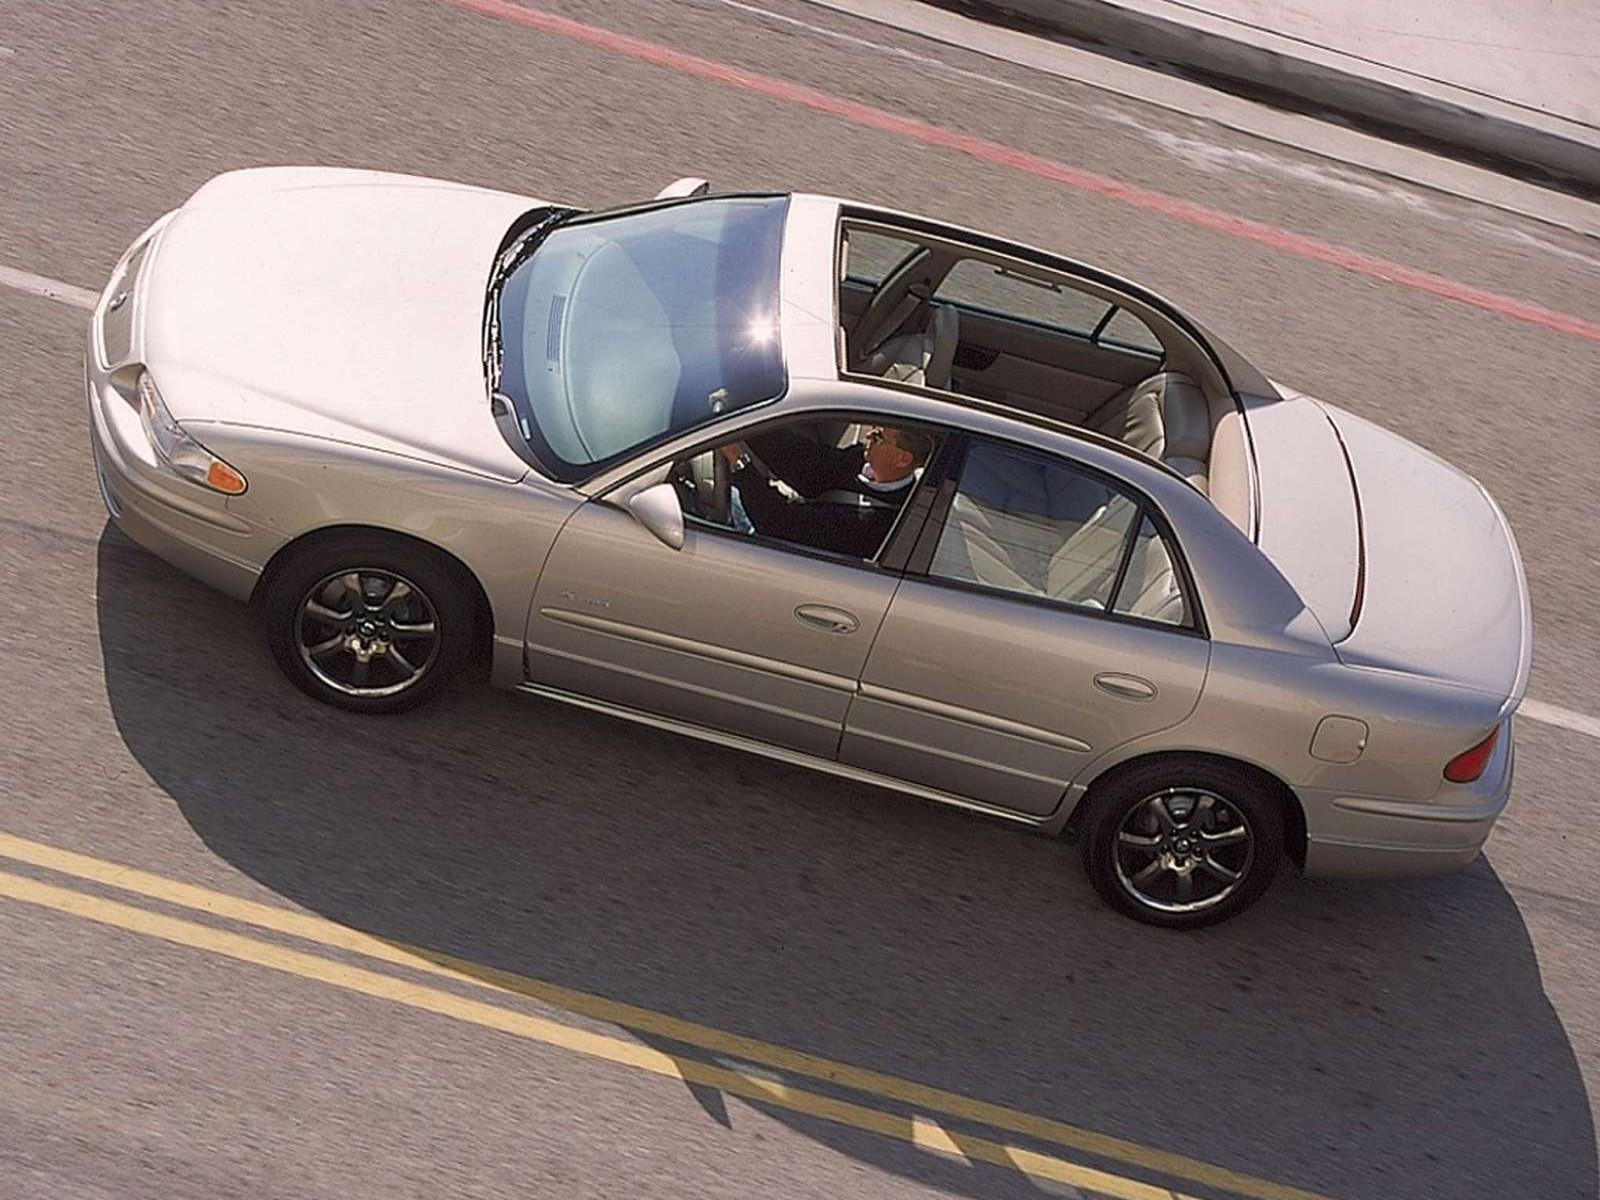 Buick regal cielo concept 2000